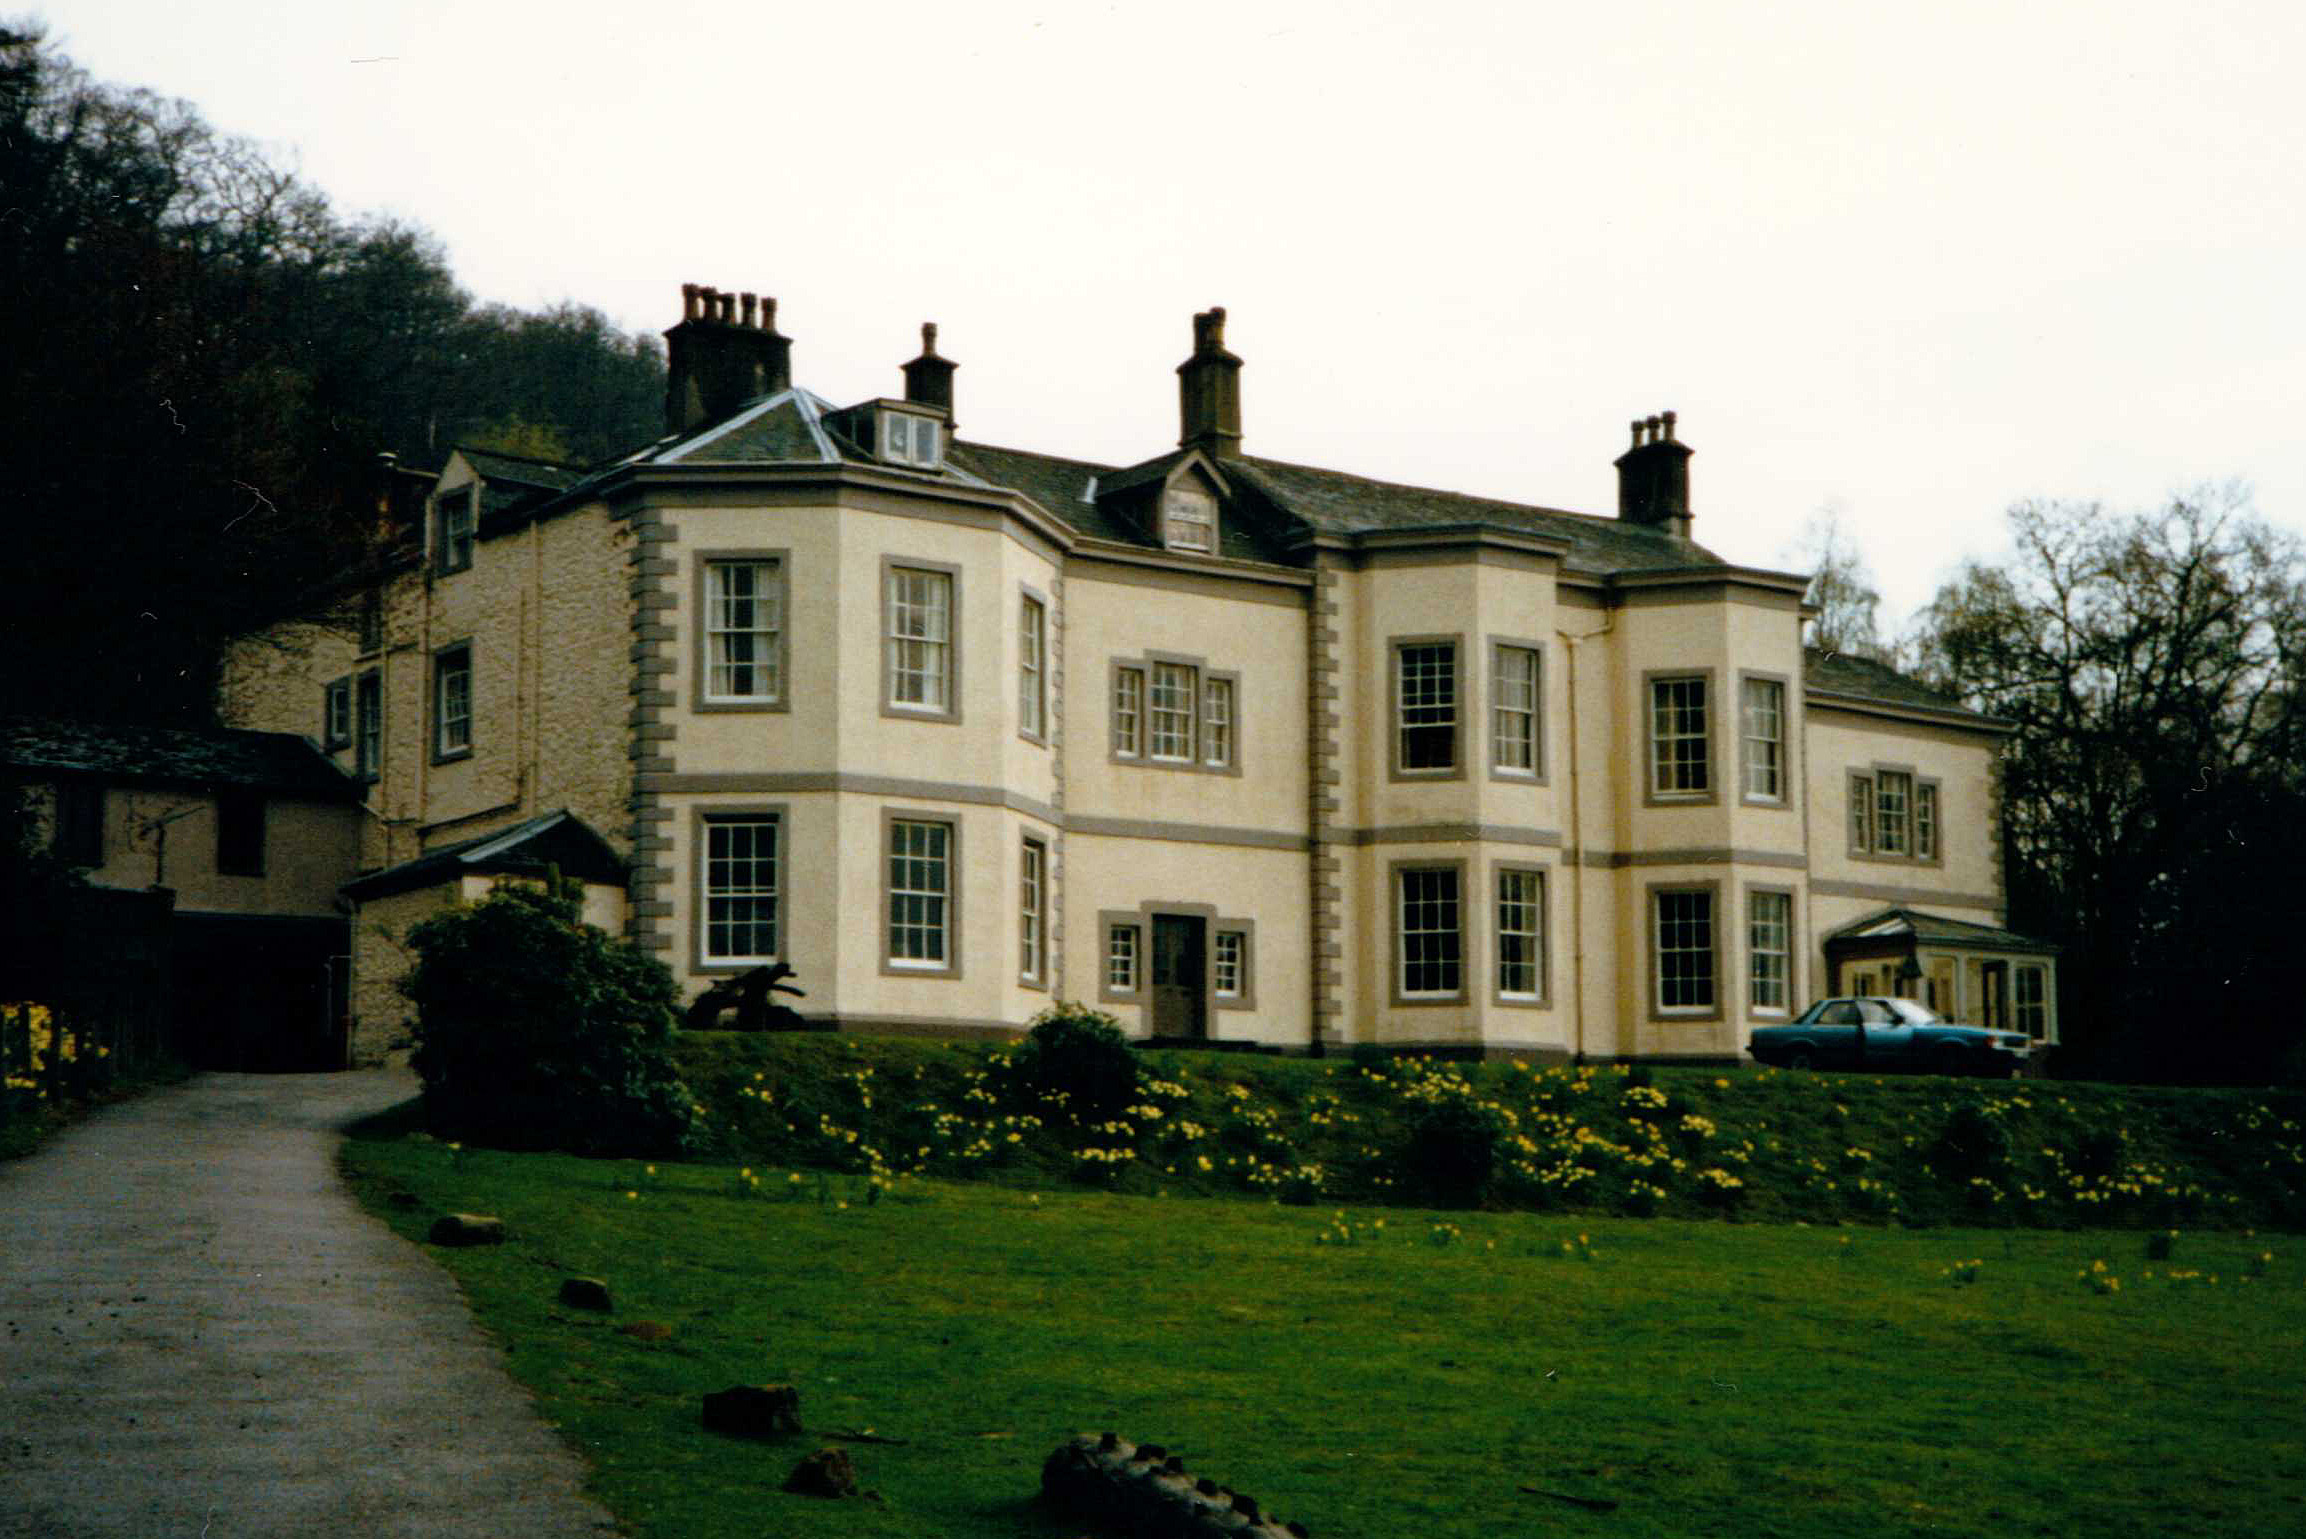 Appleby Manor House Hotel